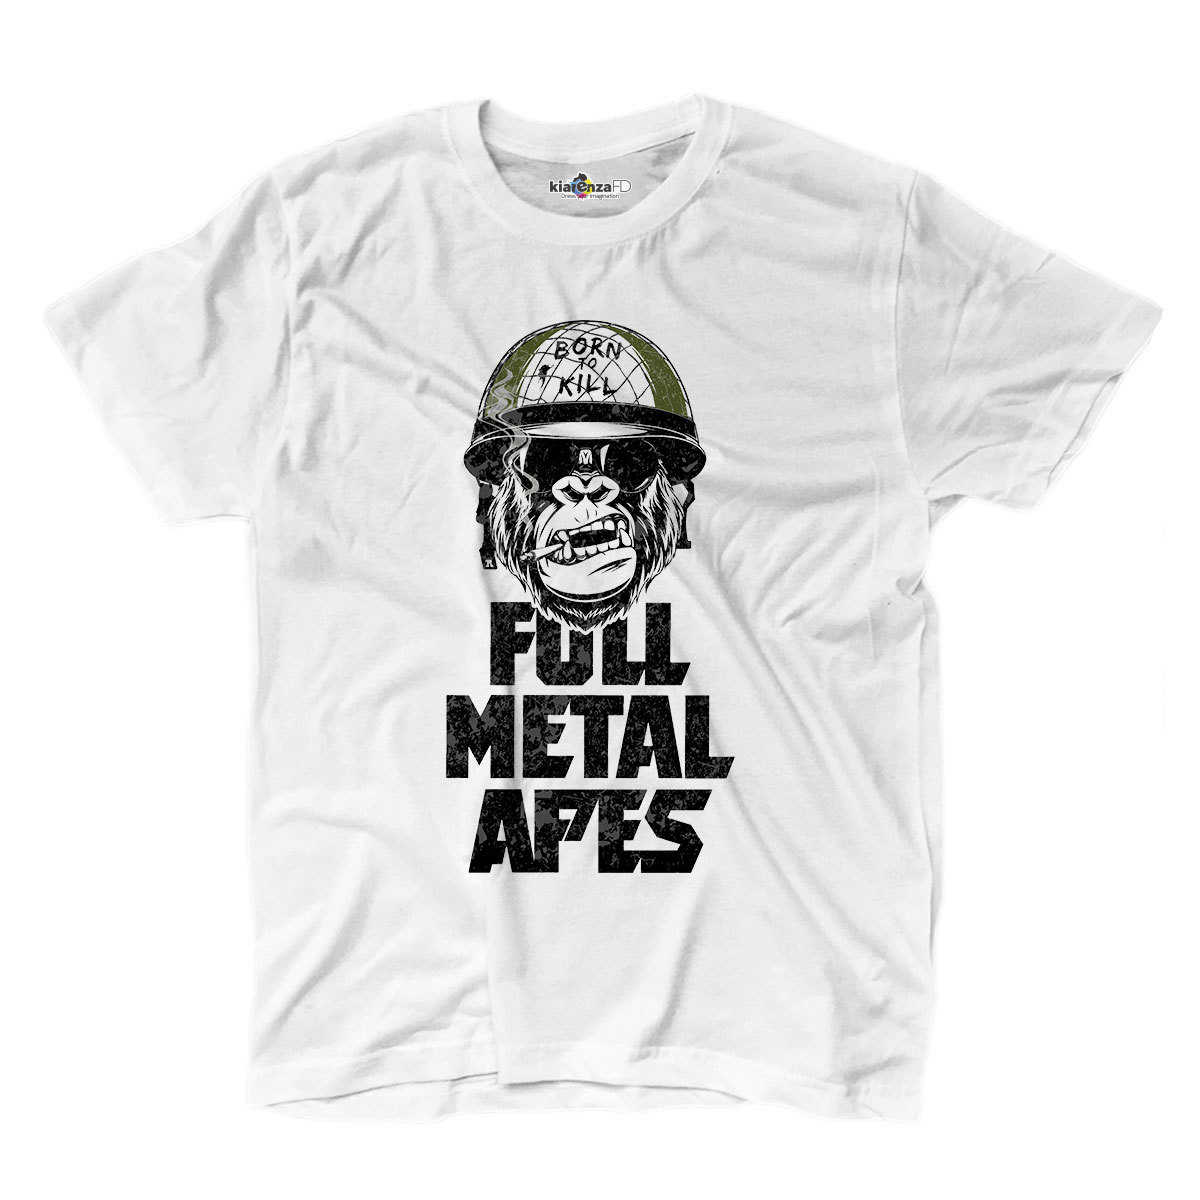 T-shirt Full Metal Apes Jacket Monkey Born To Kill Bullet Film Movie S White